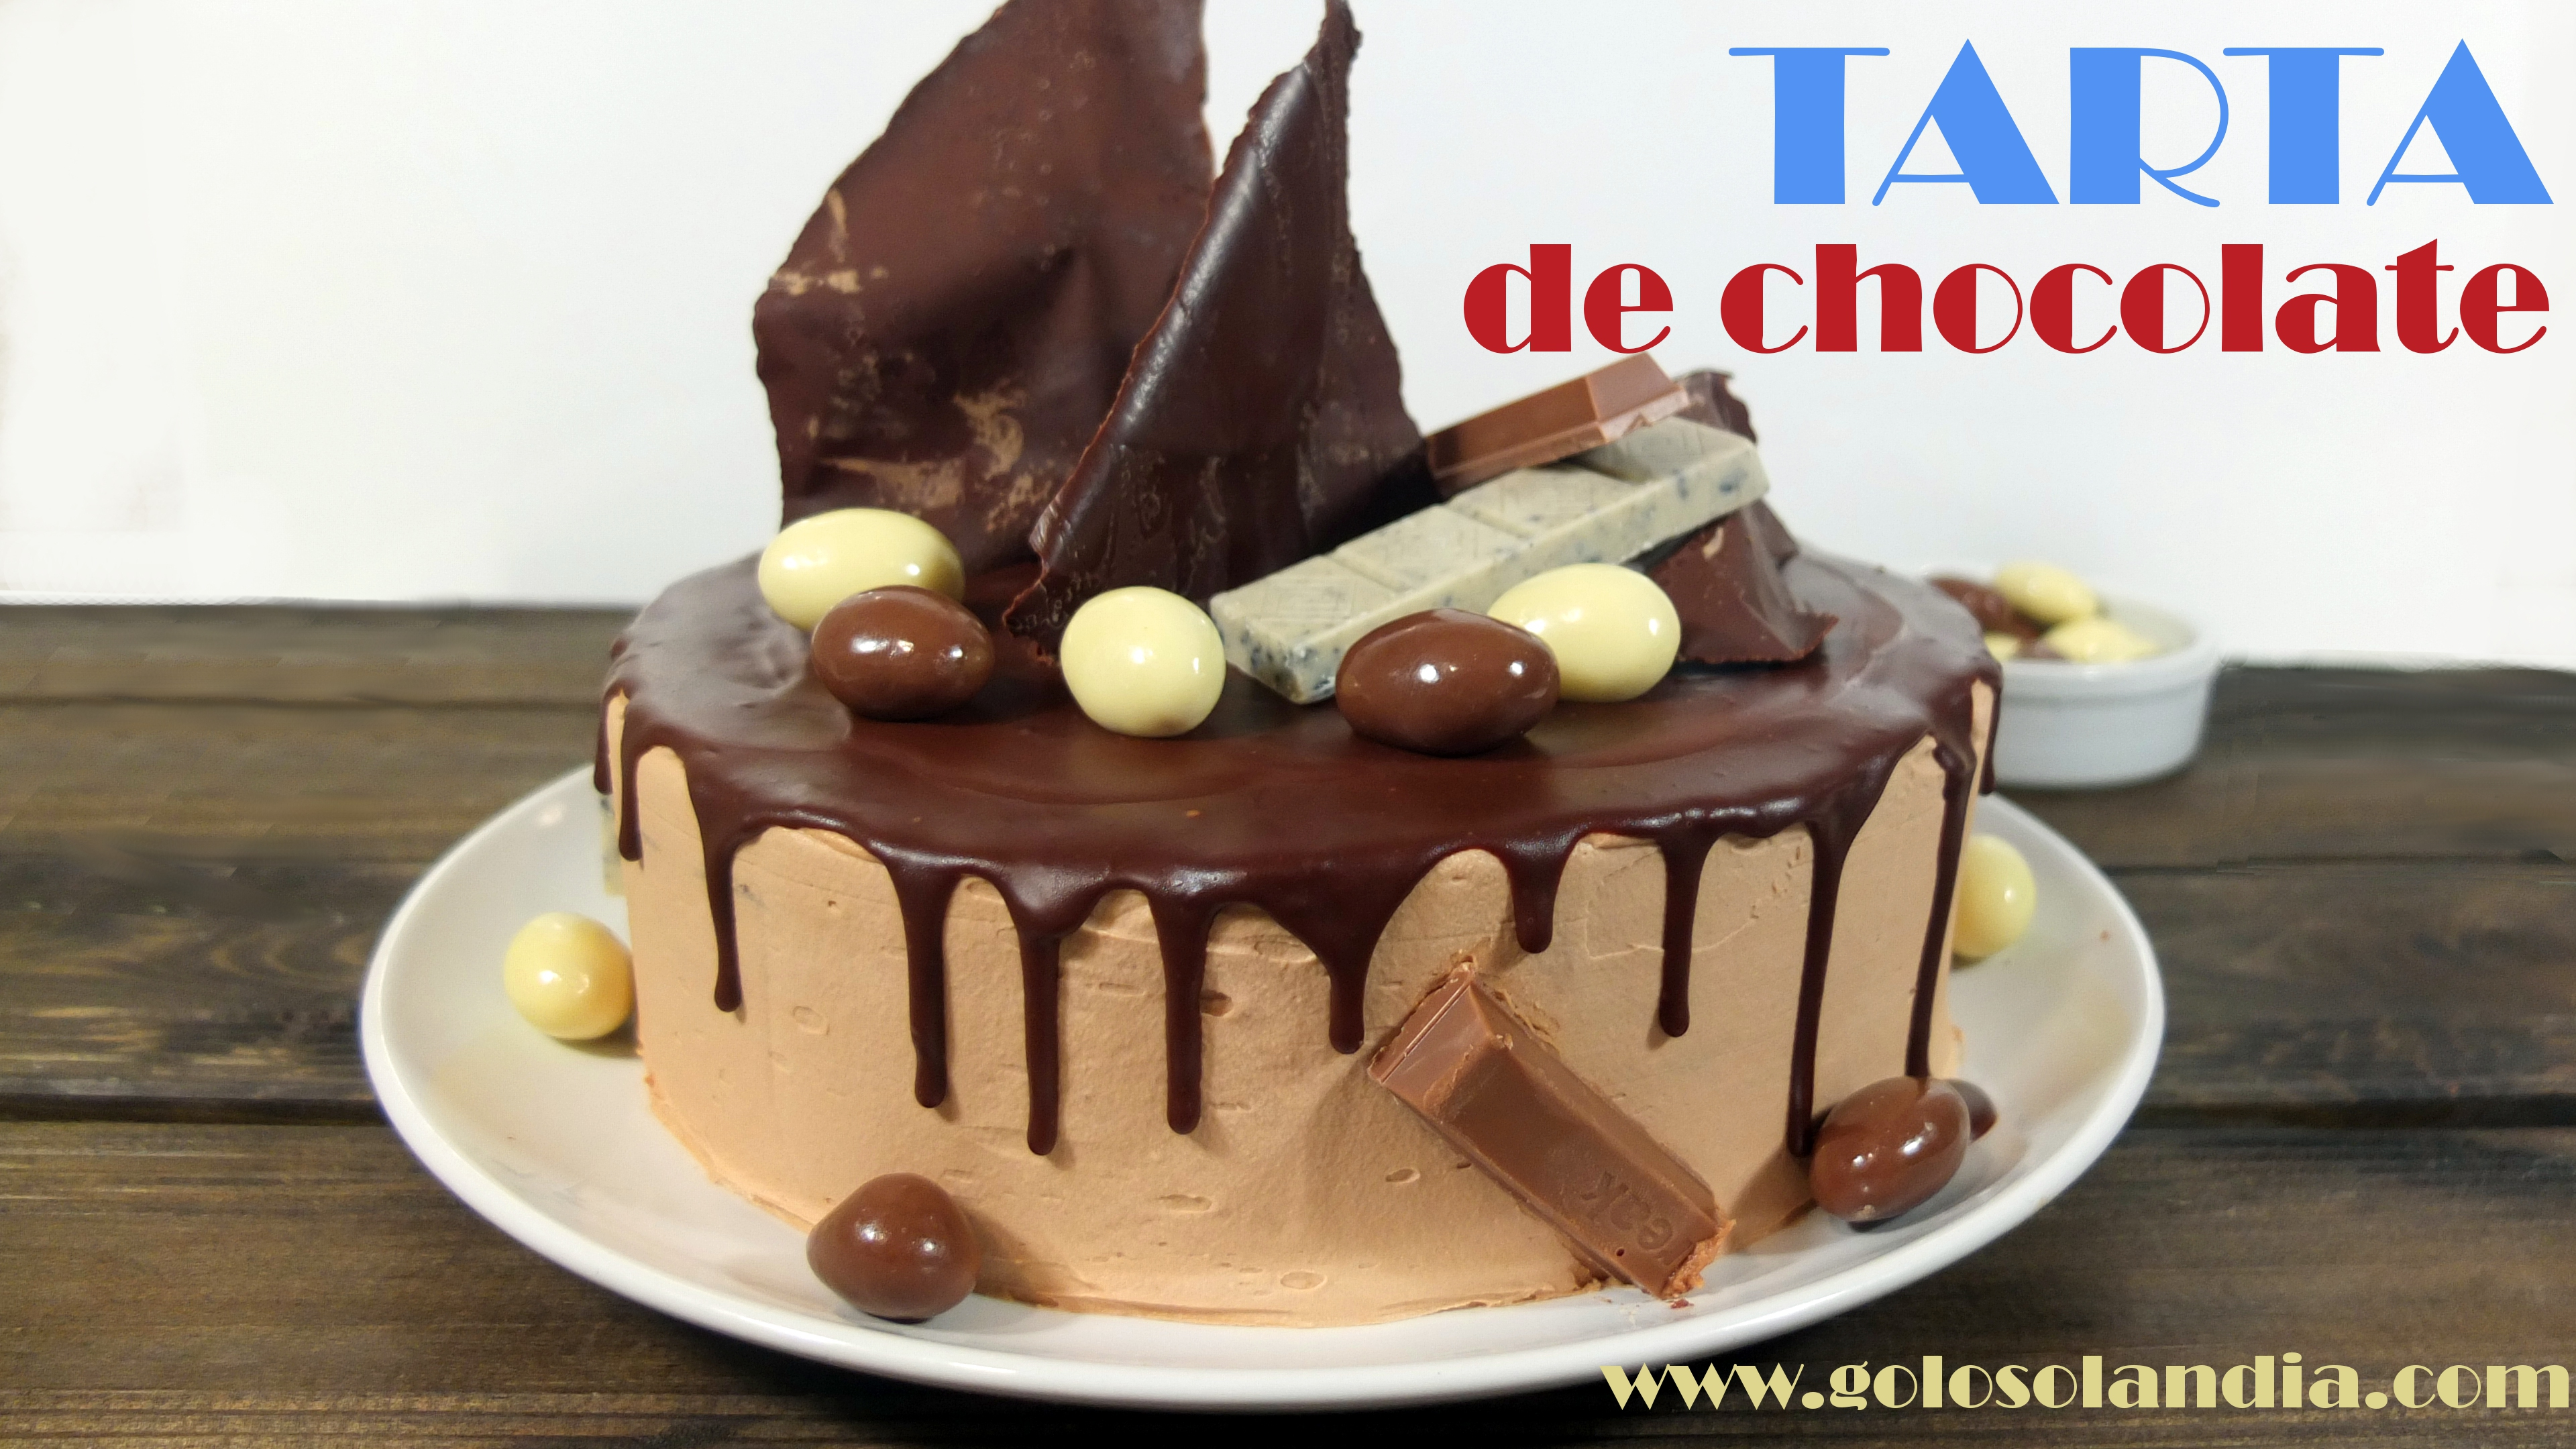 Tarta de chocolate decorada